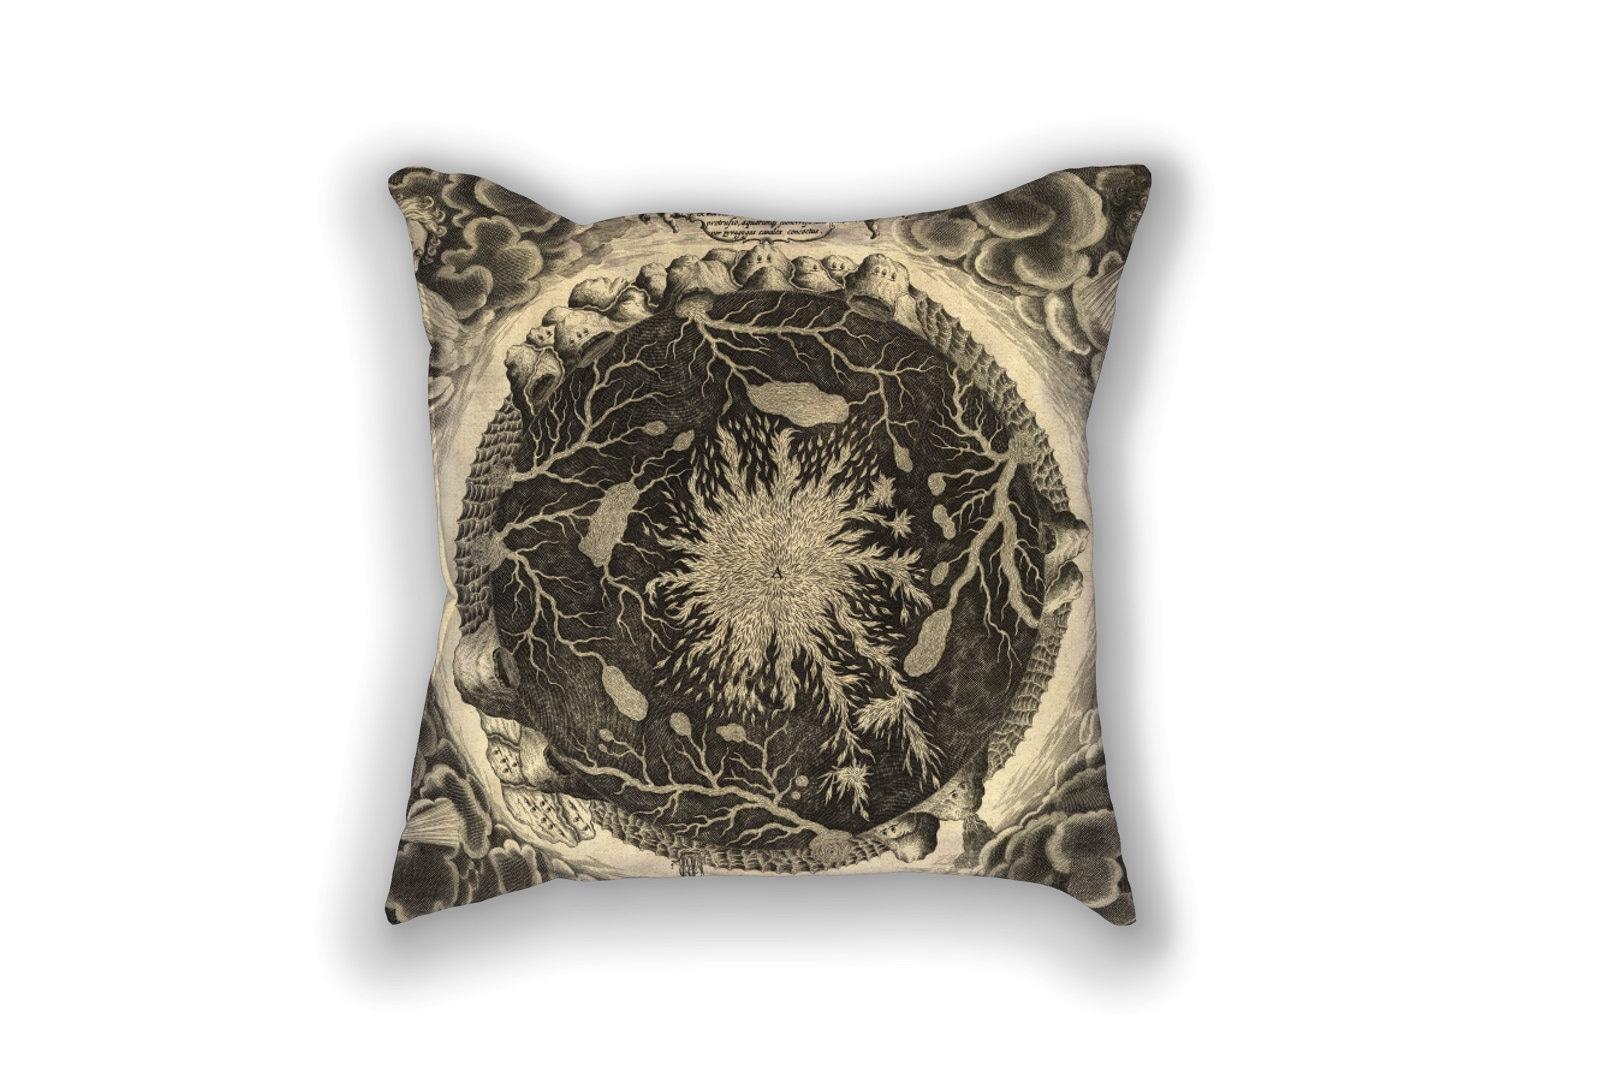 Subterranean Fires on a pillow!